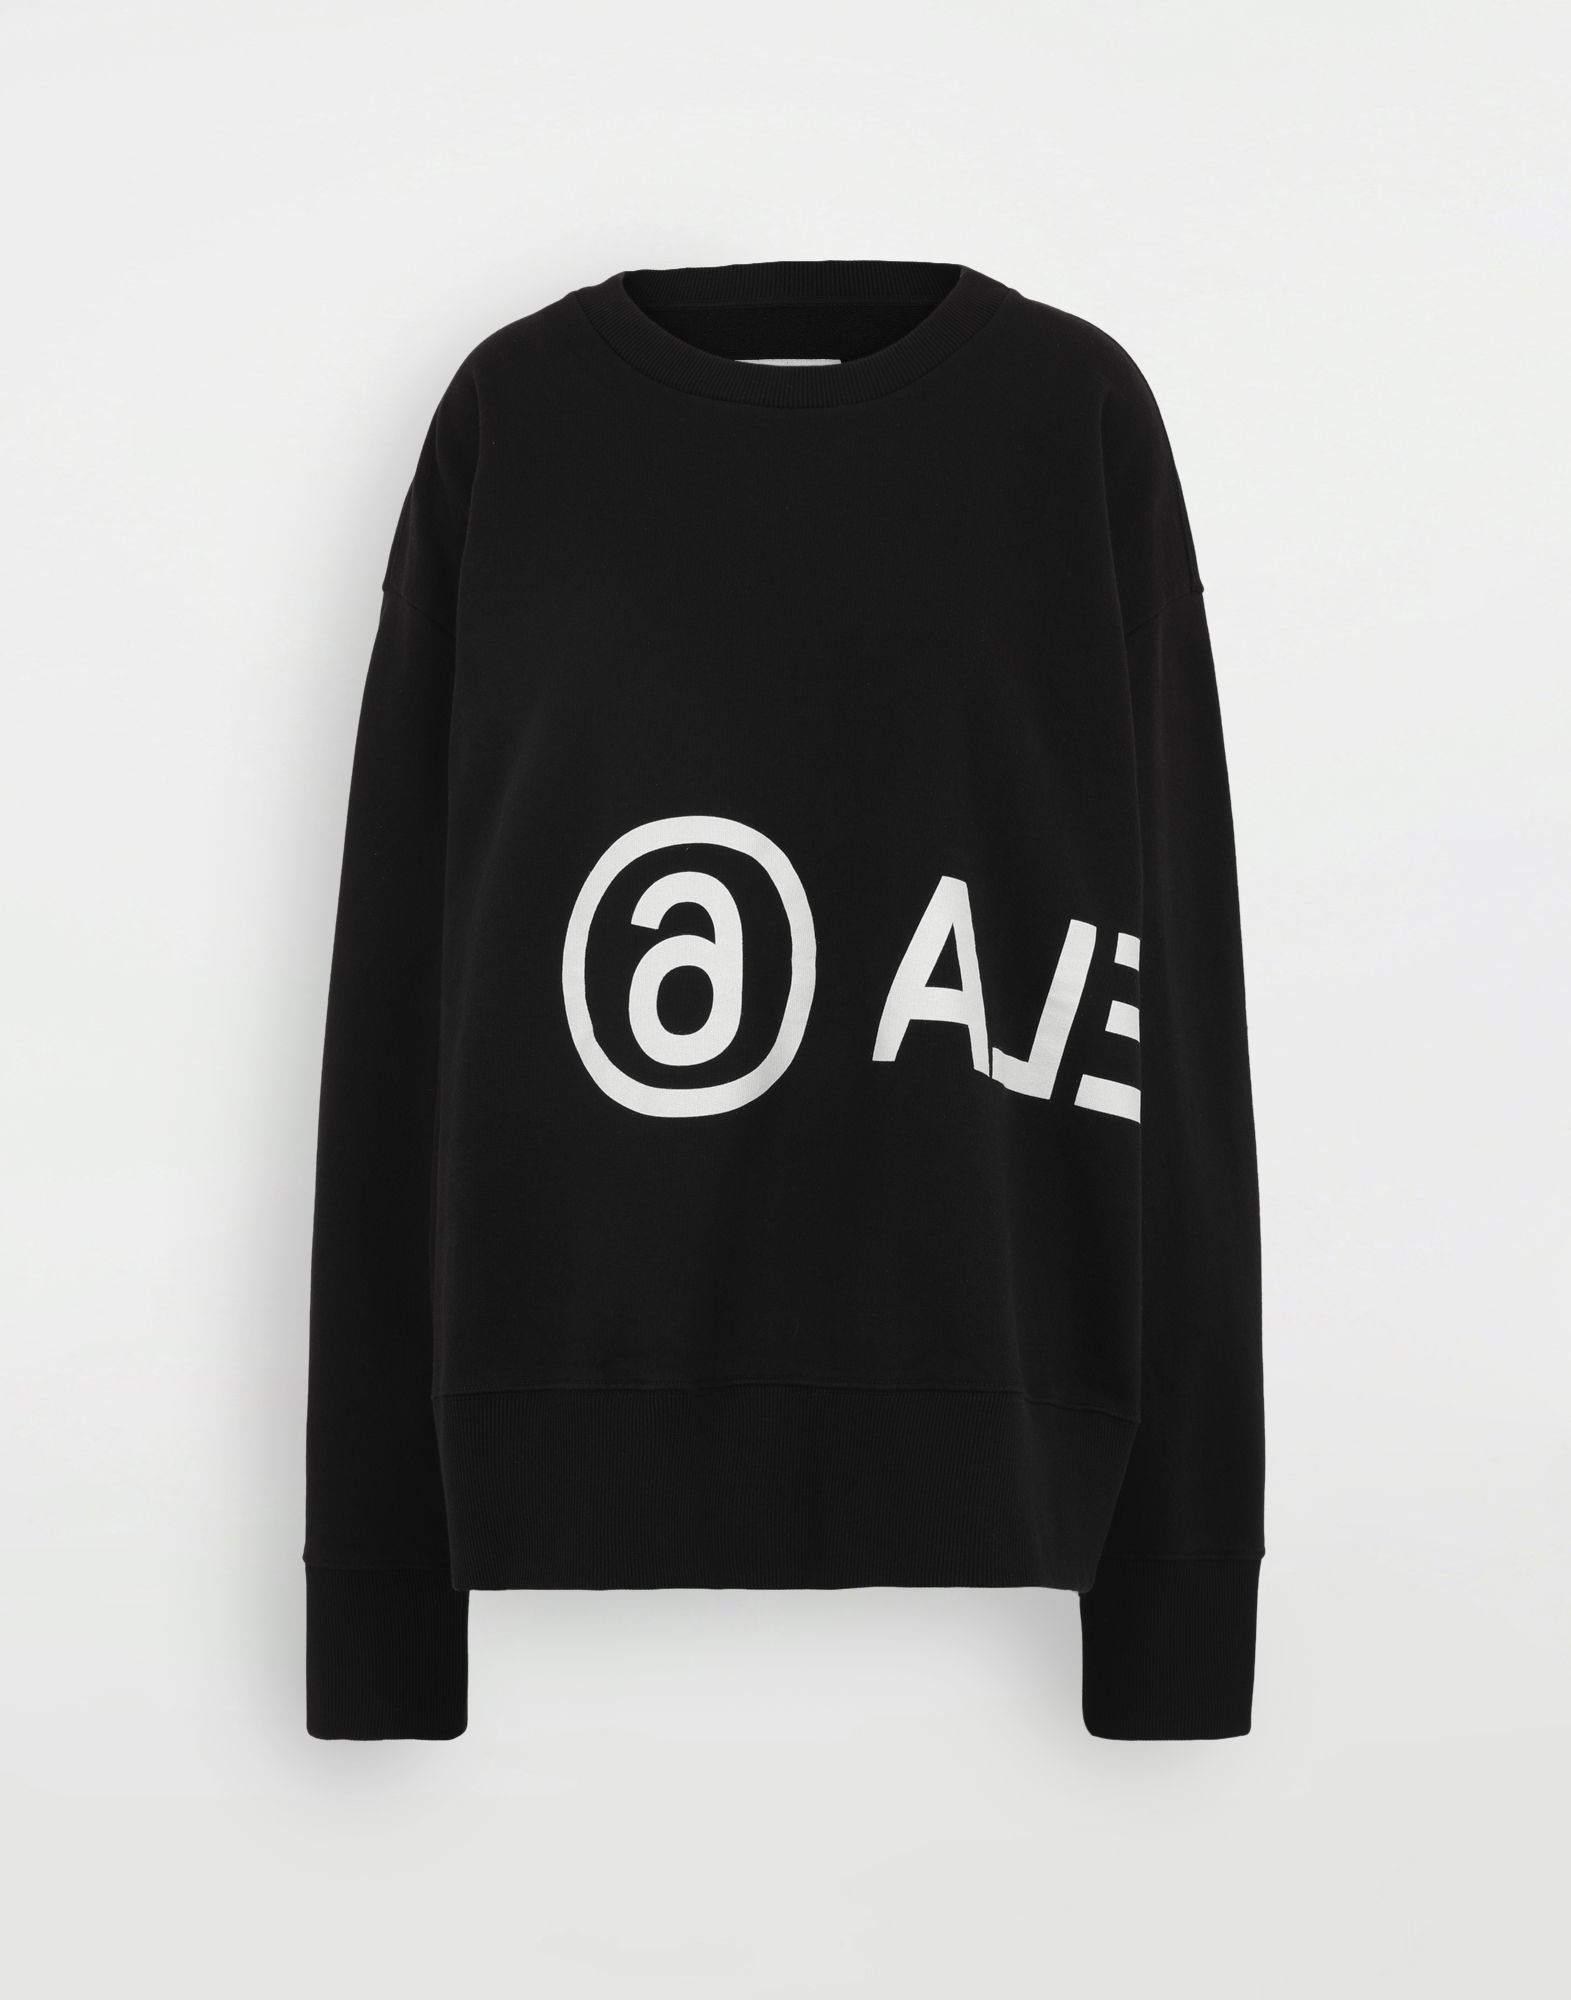 MM6 MAISON MARGIELA Reversed logo sweatshirt Sweatshirt Woman f